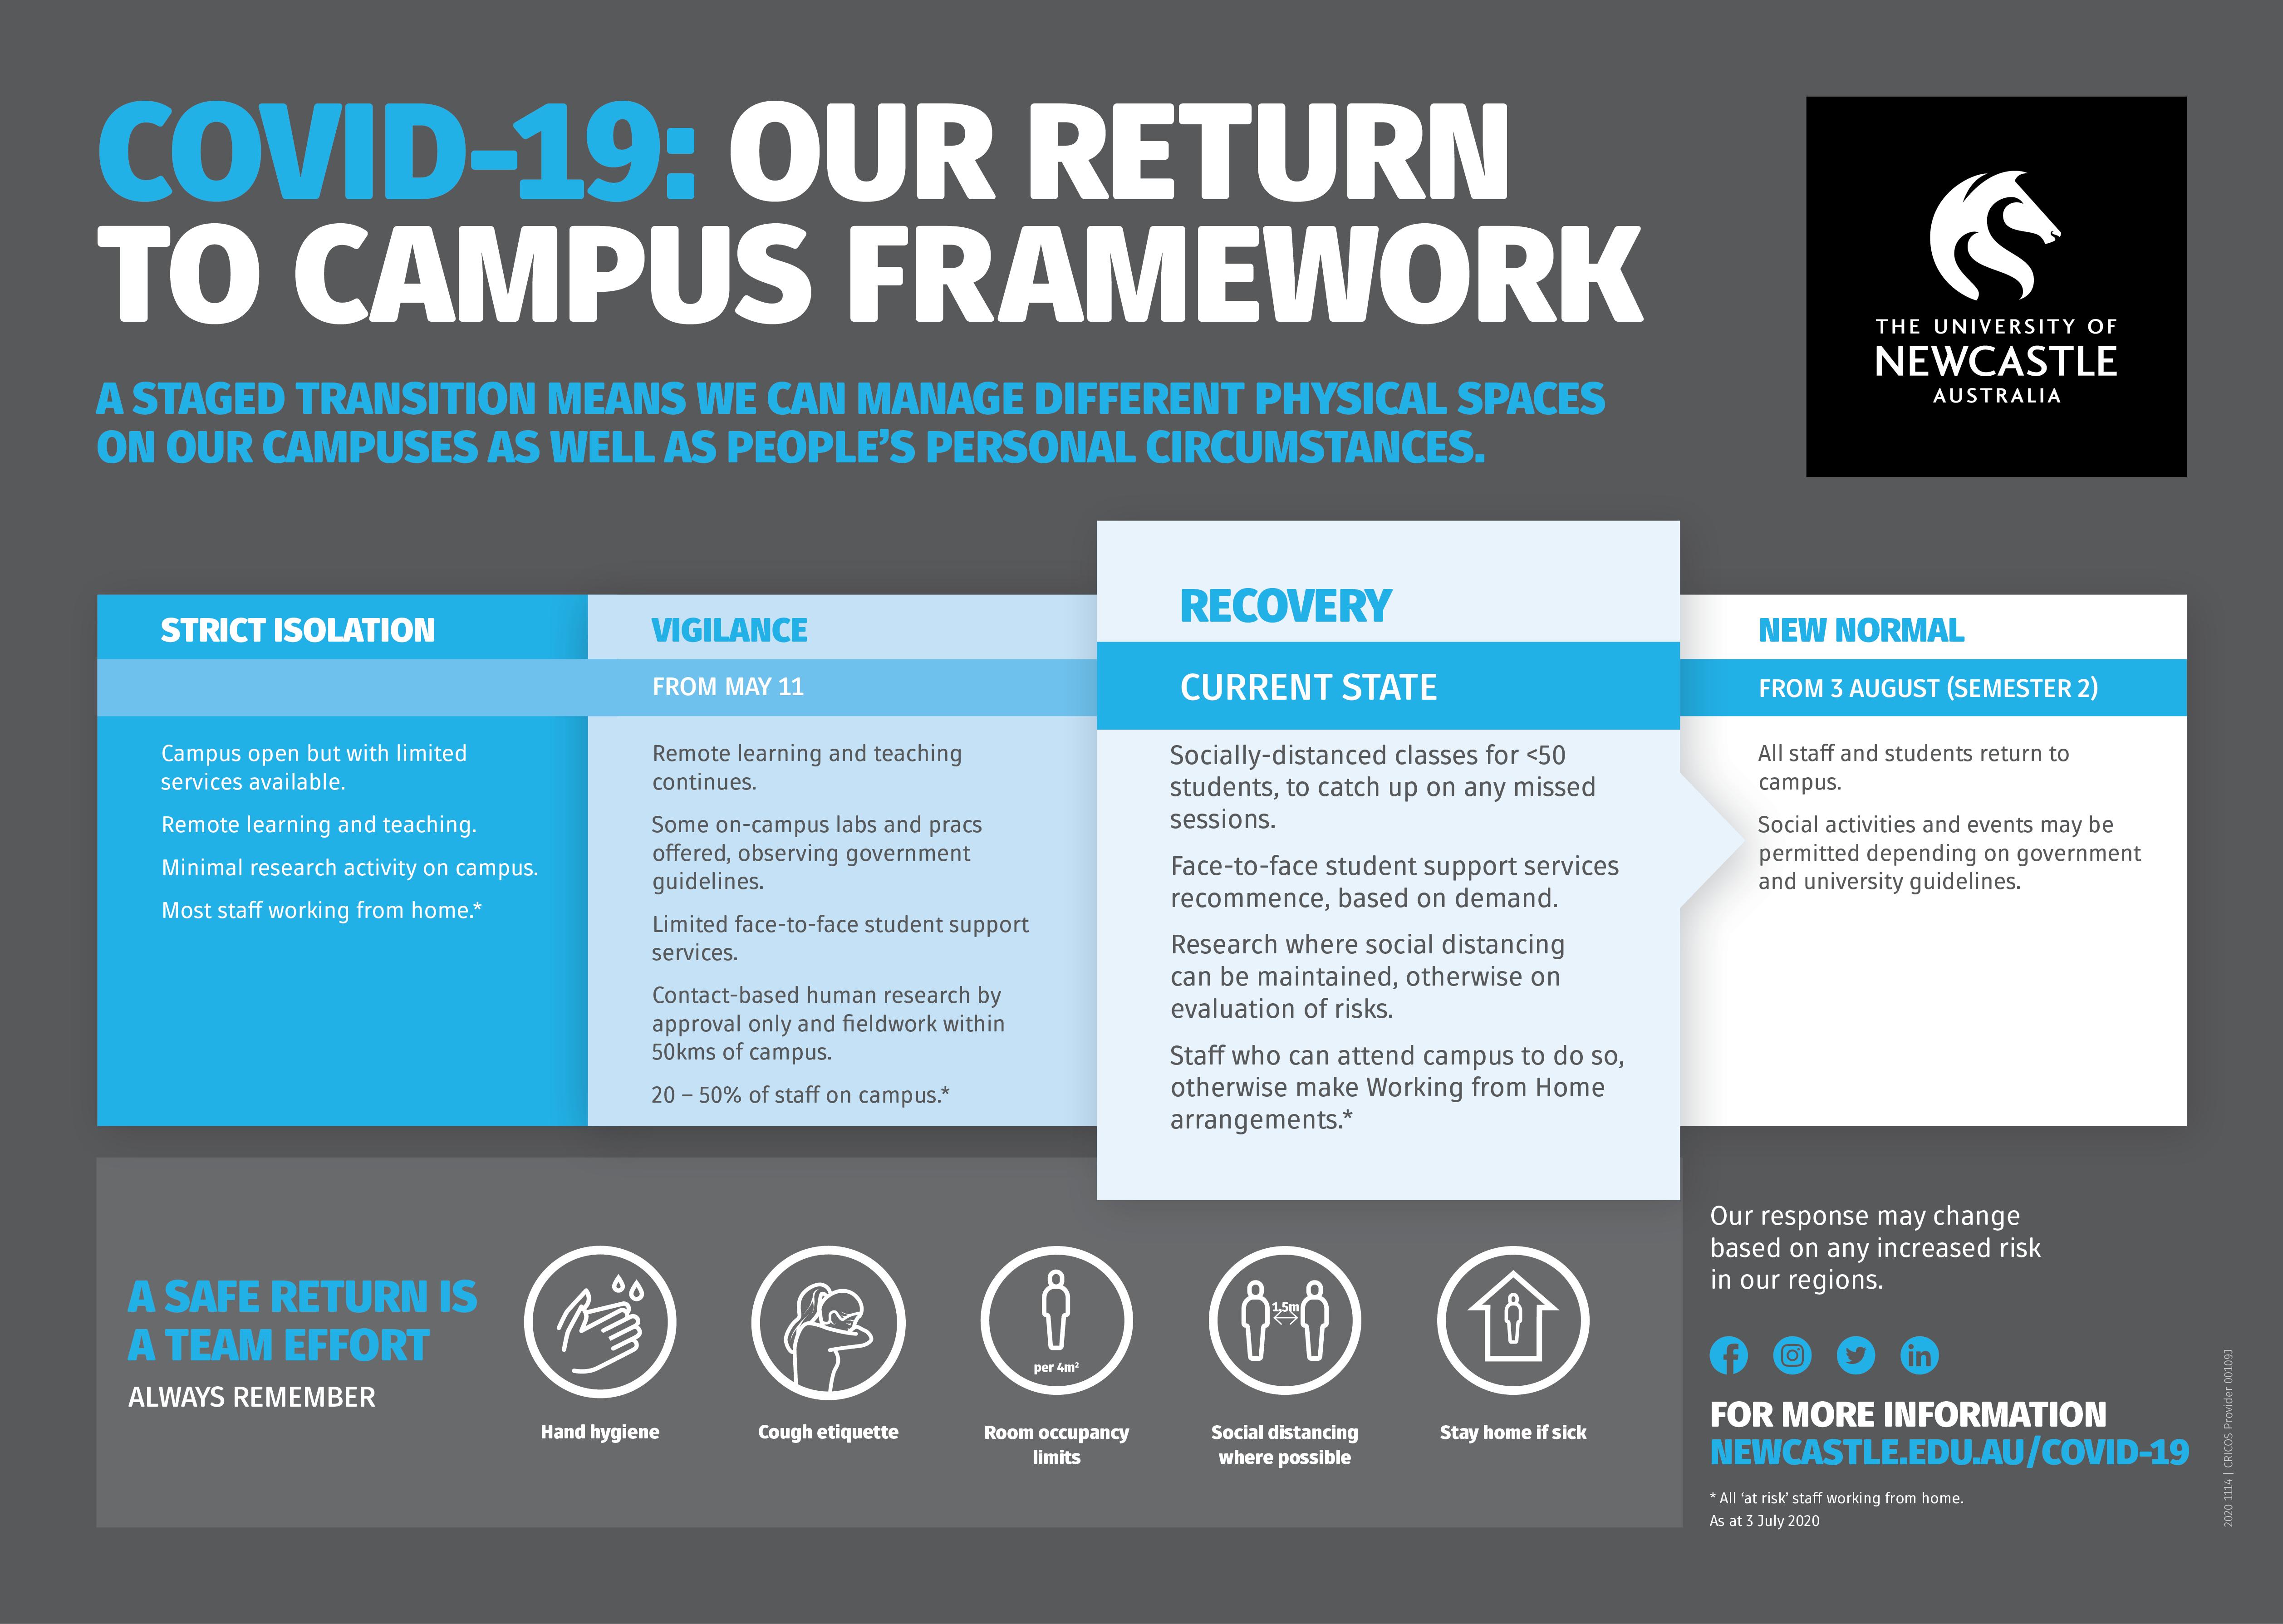 Return to campus framework